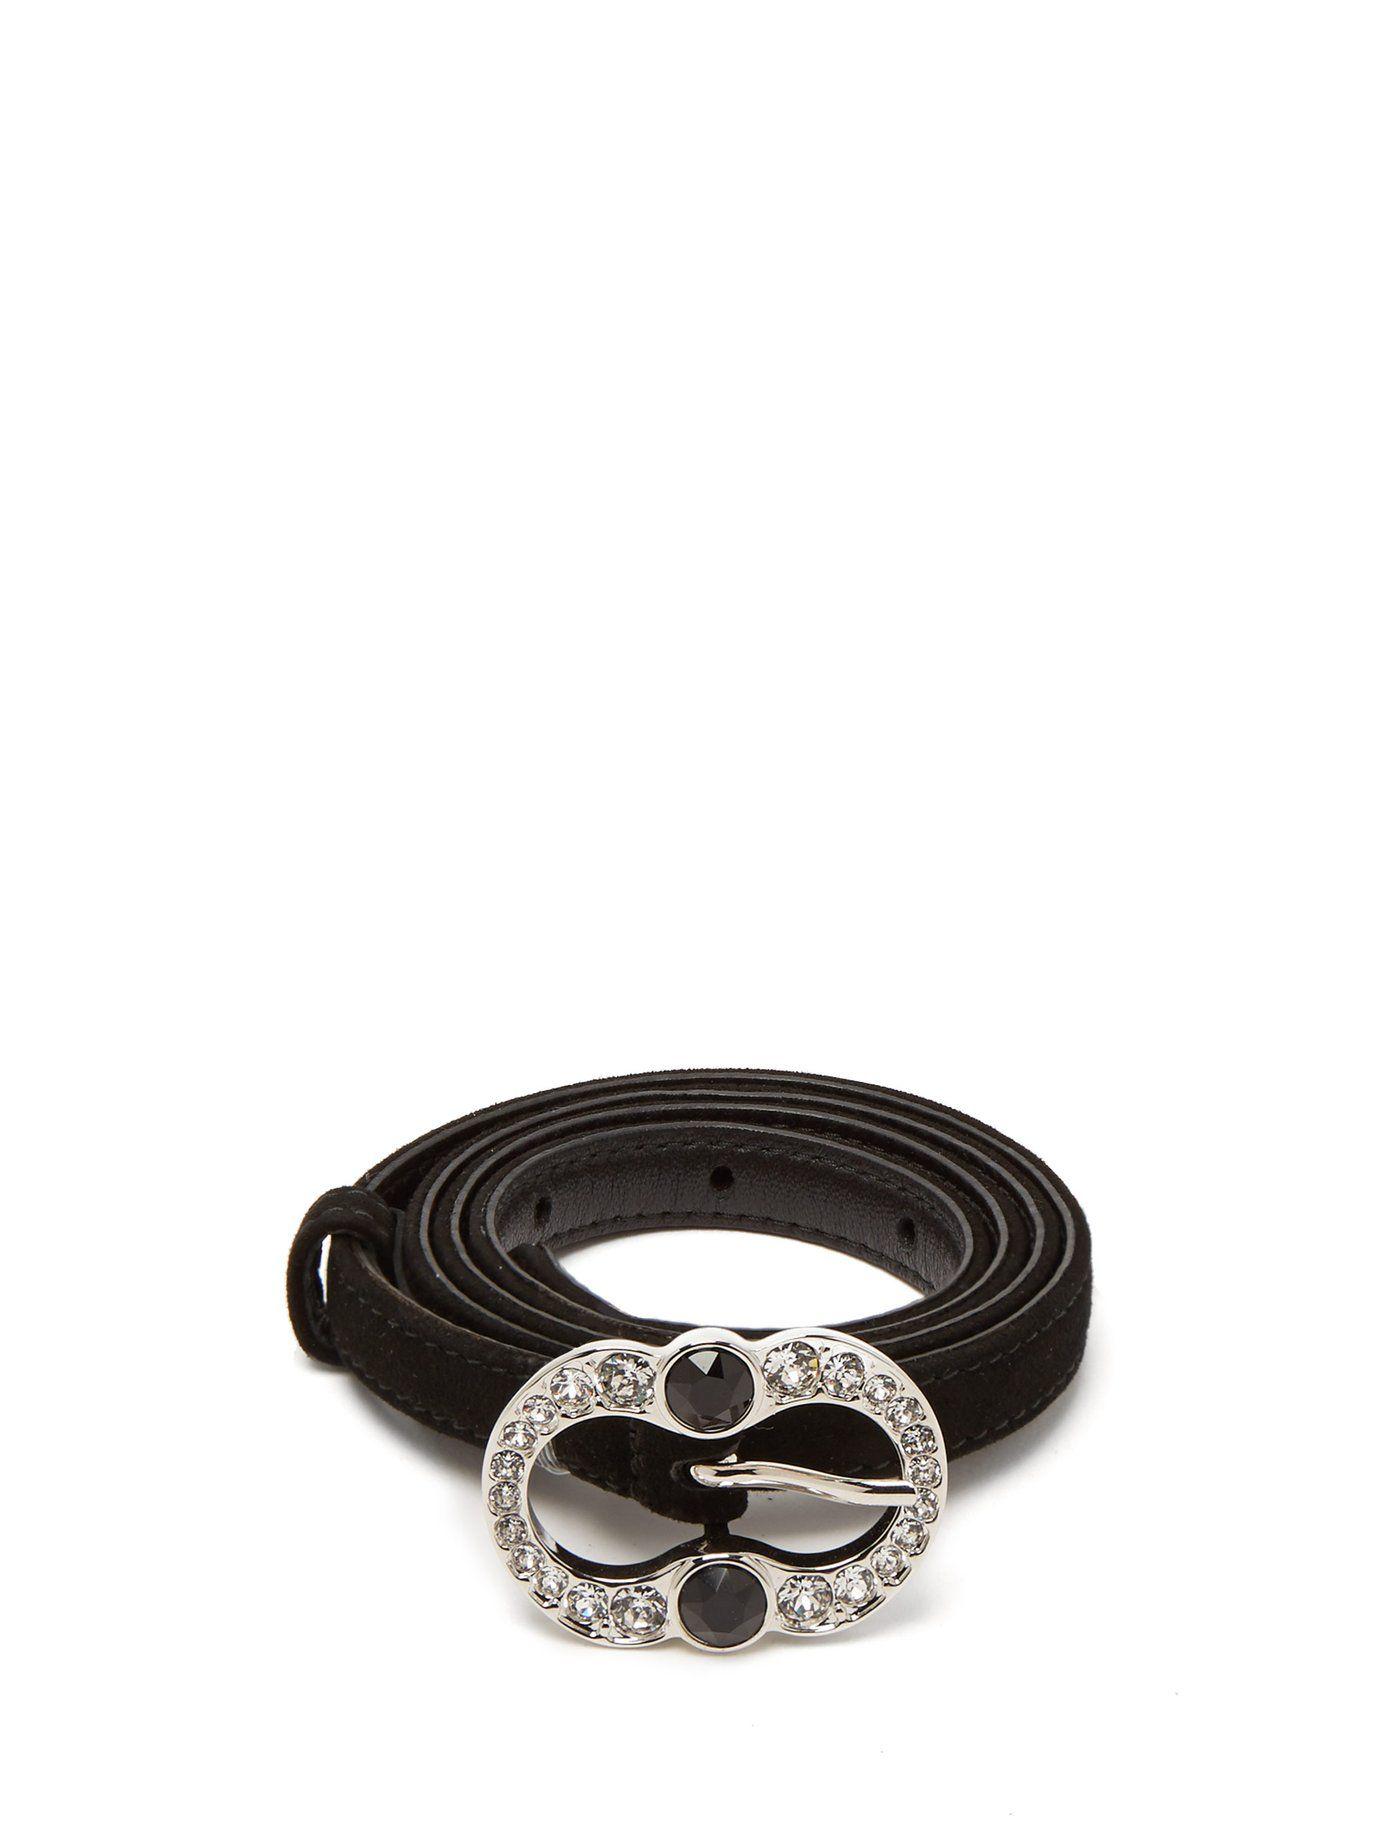 583c6fcc043903 Crystal-embellished suede belt | Prada | MATCHESFASHION.COM | Cintos ...